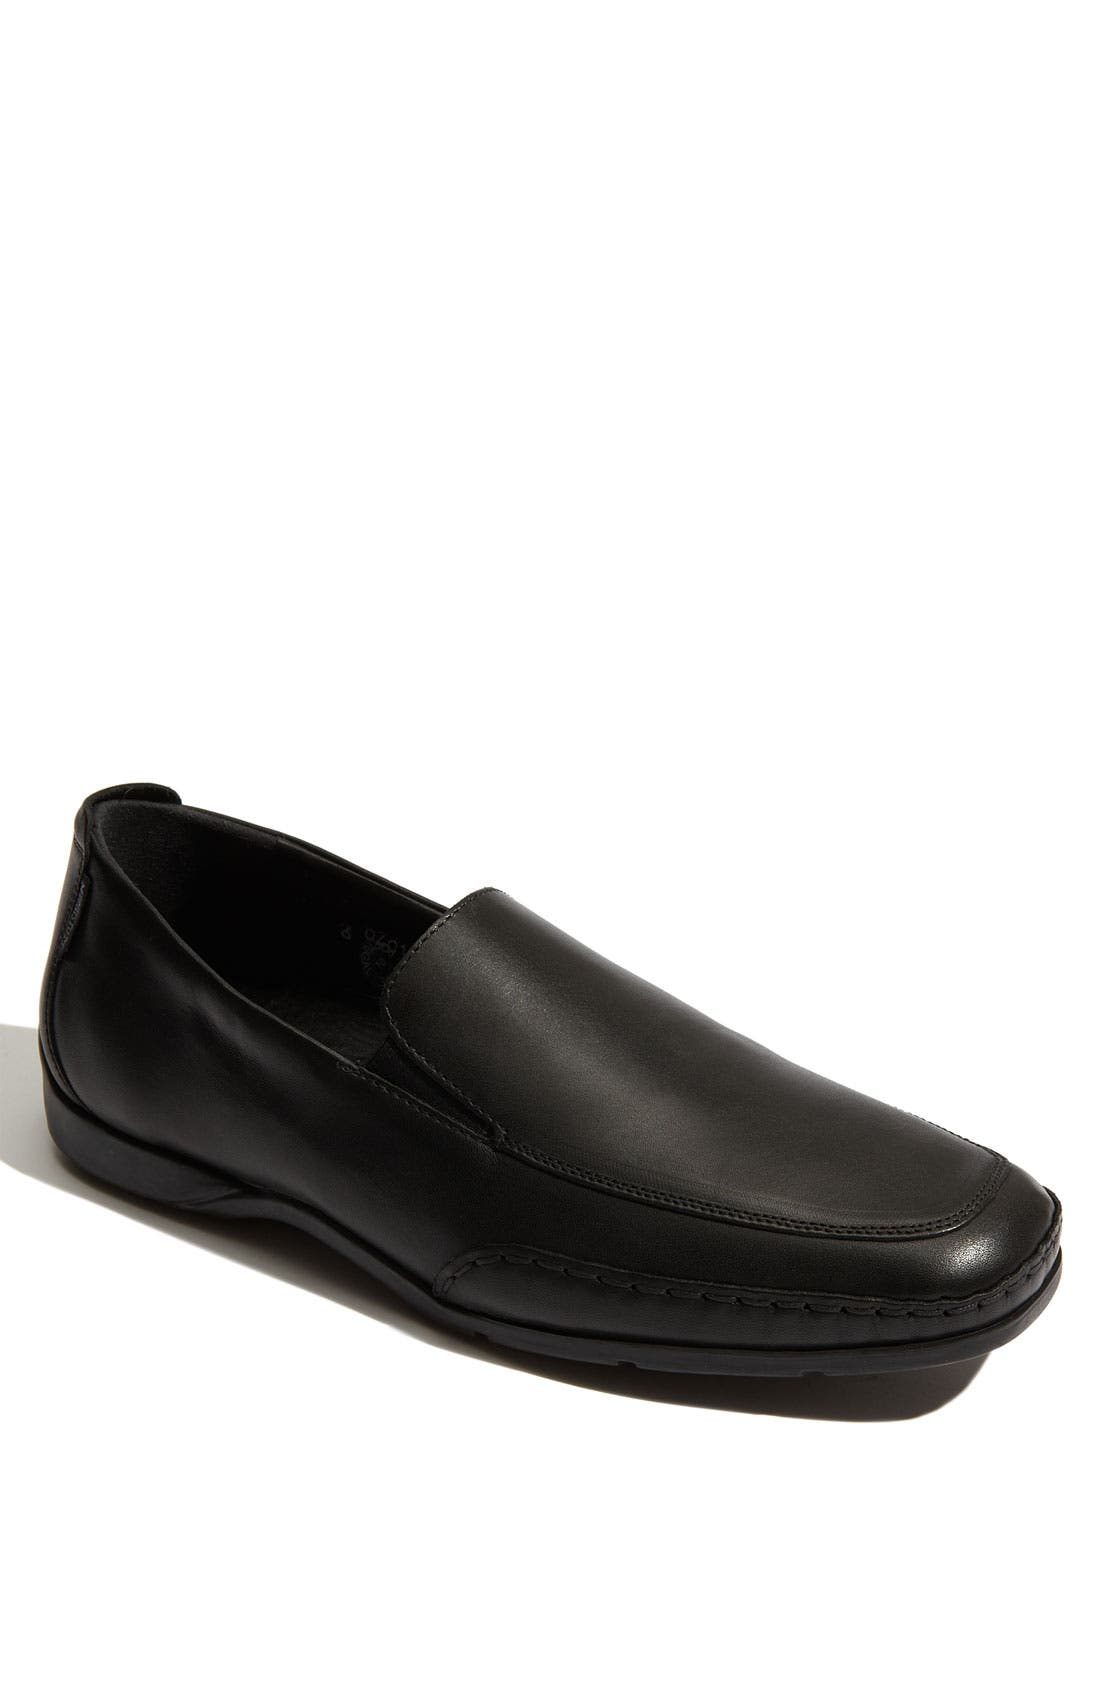 'Edlef' Slip-On,                             Main thumbnail 1, color,                             Black Smooth Leather